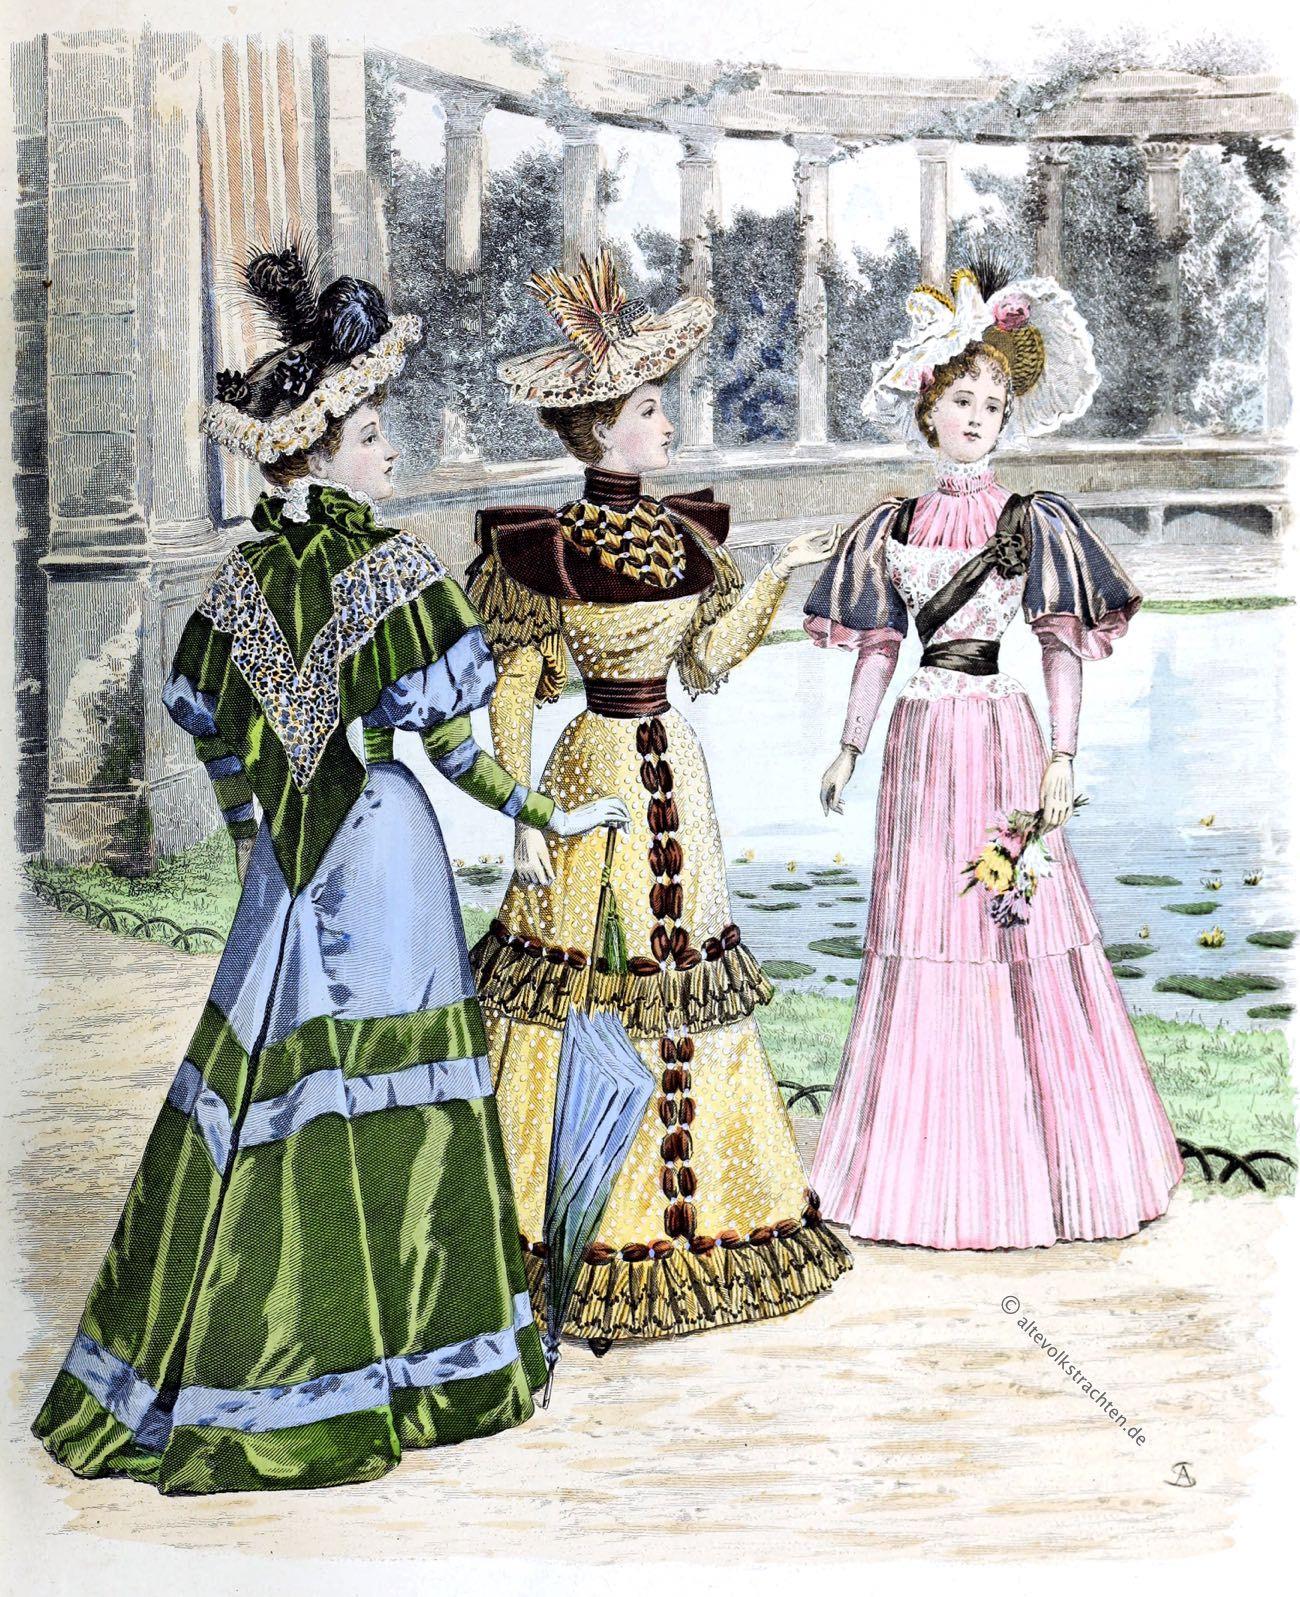 latest paris fashion. the queen 1893. english fashion